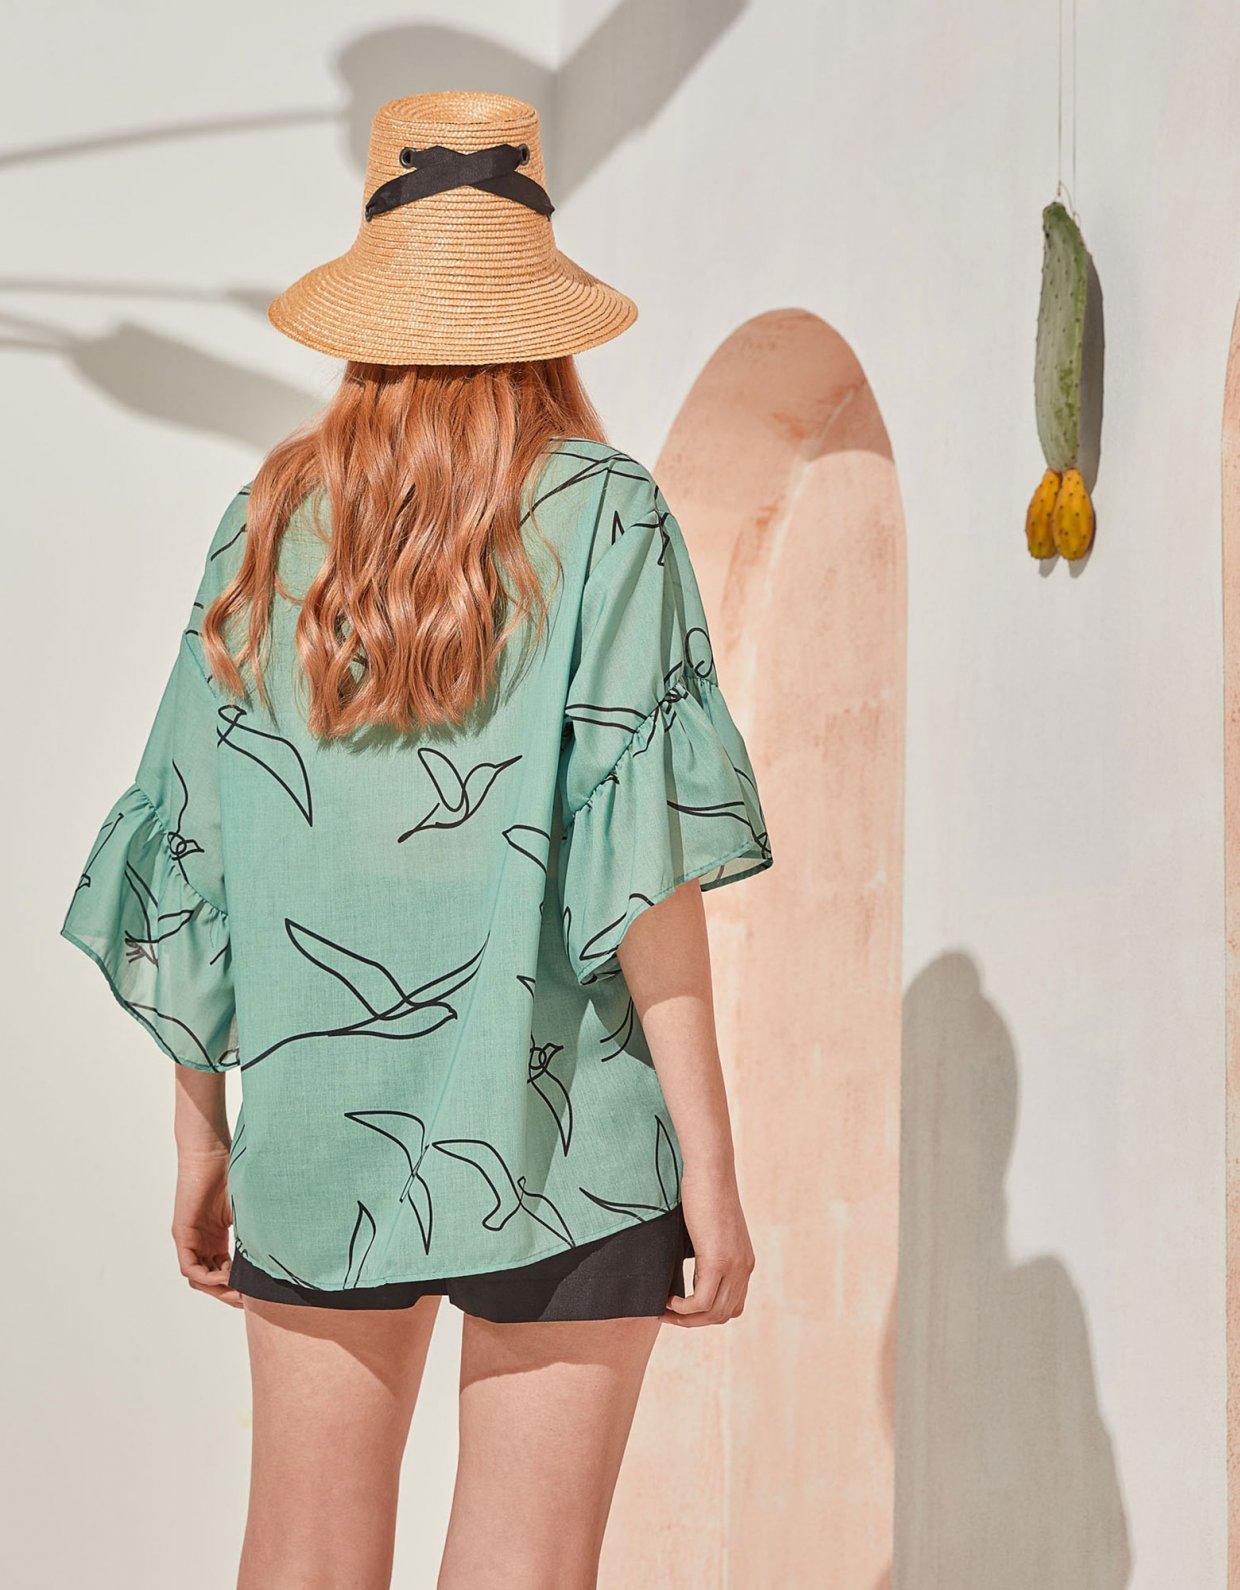 The Knl's Leisure tunic blouse mint birds